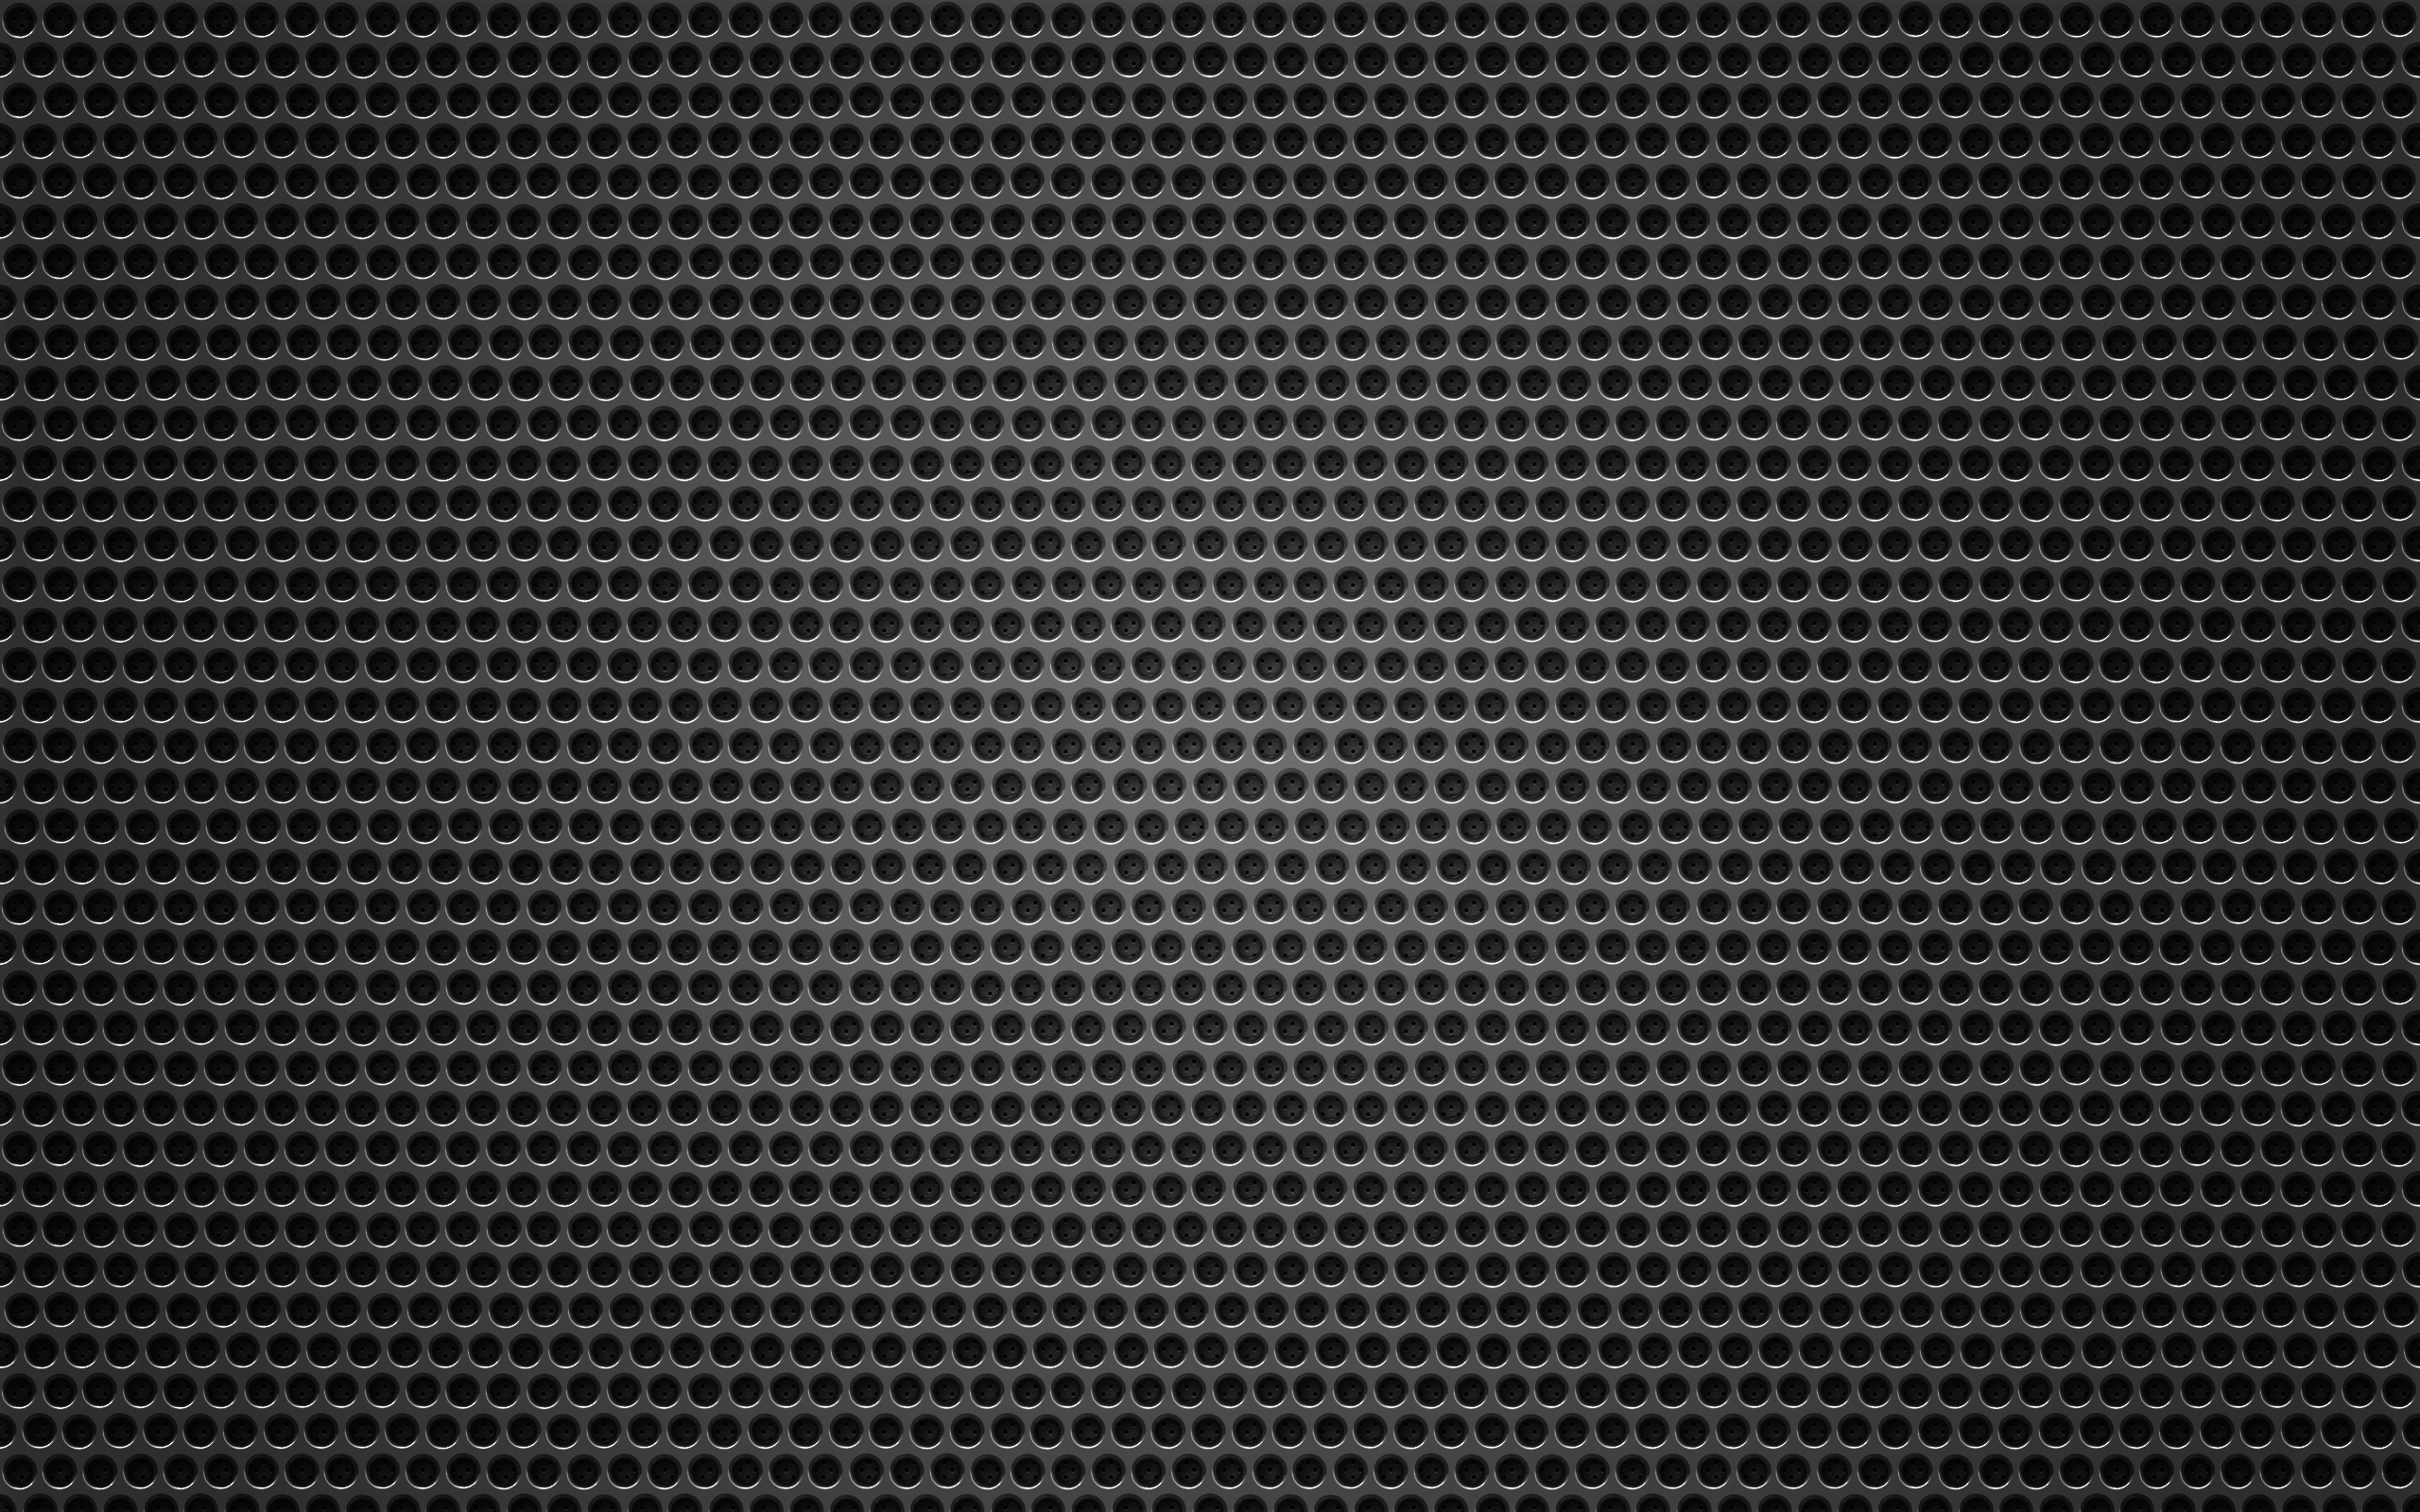 Black Metal Holes Background   Desktop Wallpaper 2560x1600